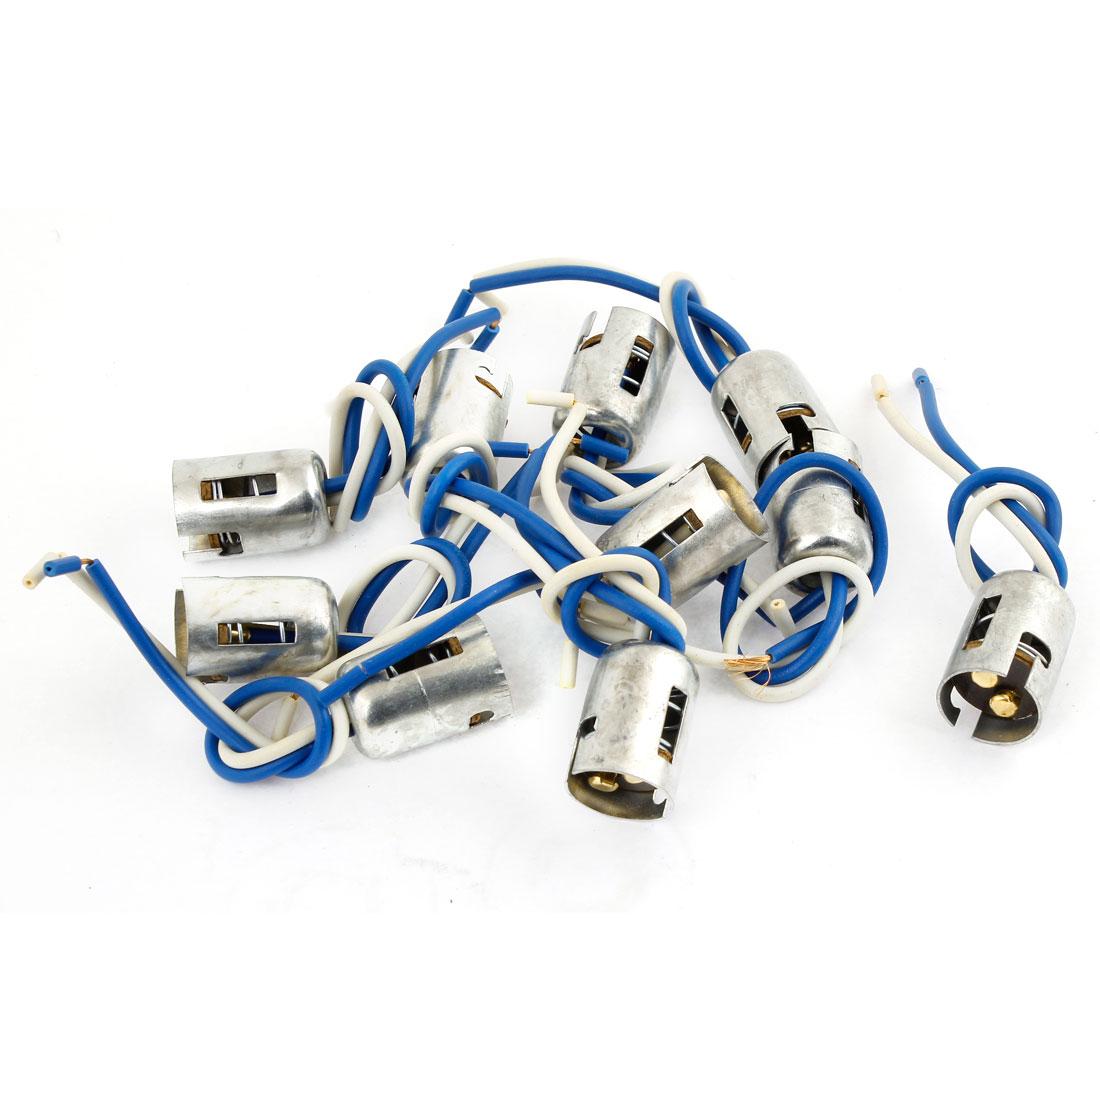 10 Pcs DC 12V 1157 1016 Bulb Socket Brake Turn Signal Light Harness Wire Adapter